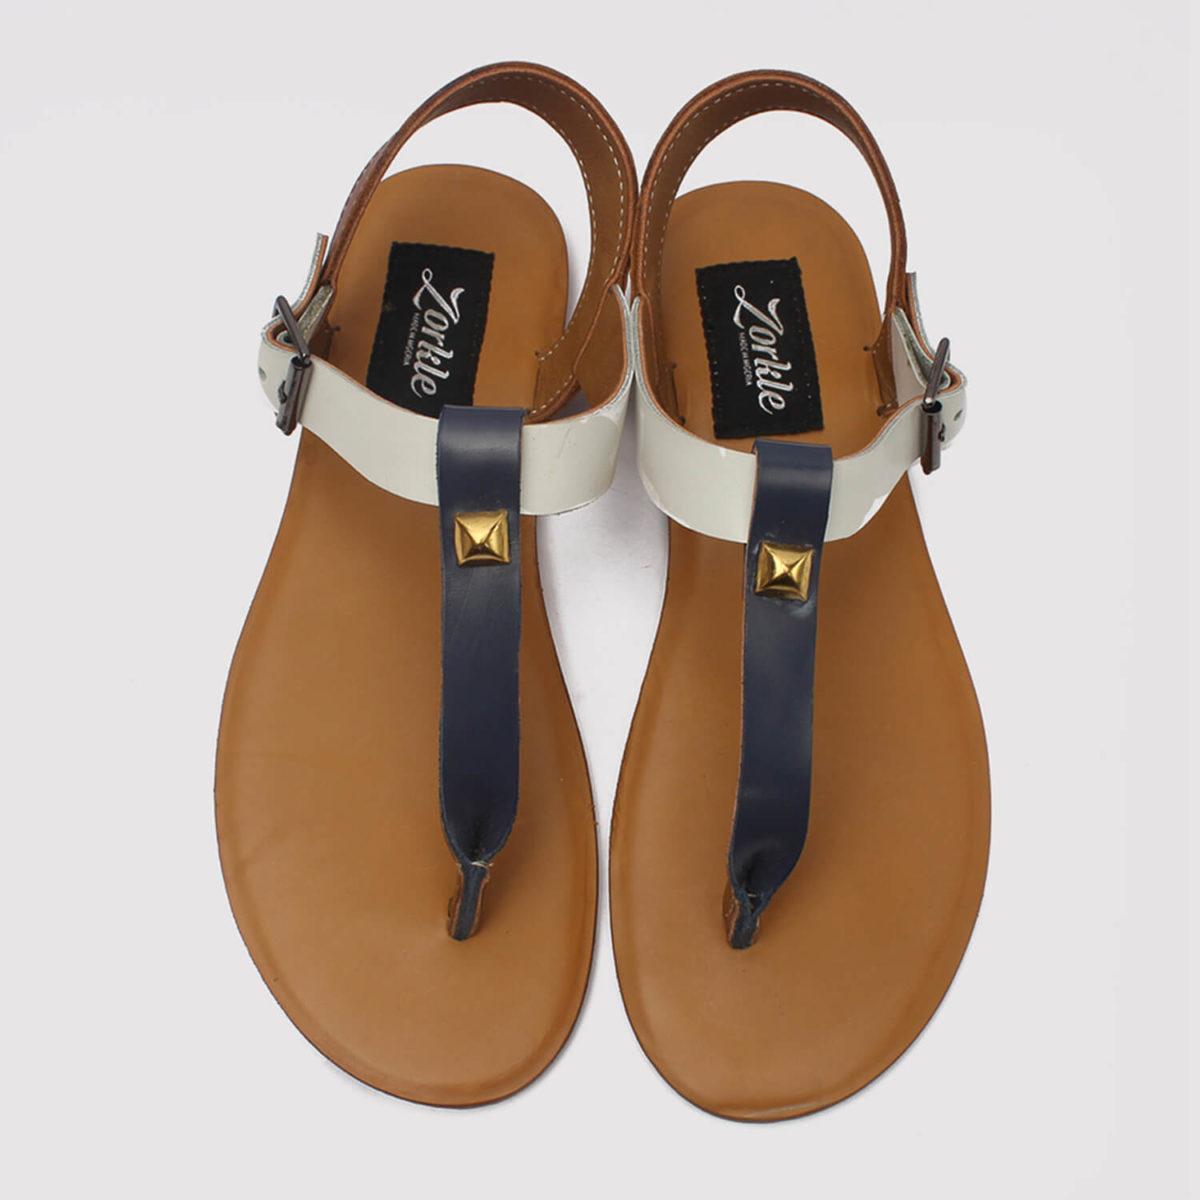 toke sandals blue brown white zorkle shoes lagos nigeria